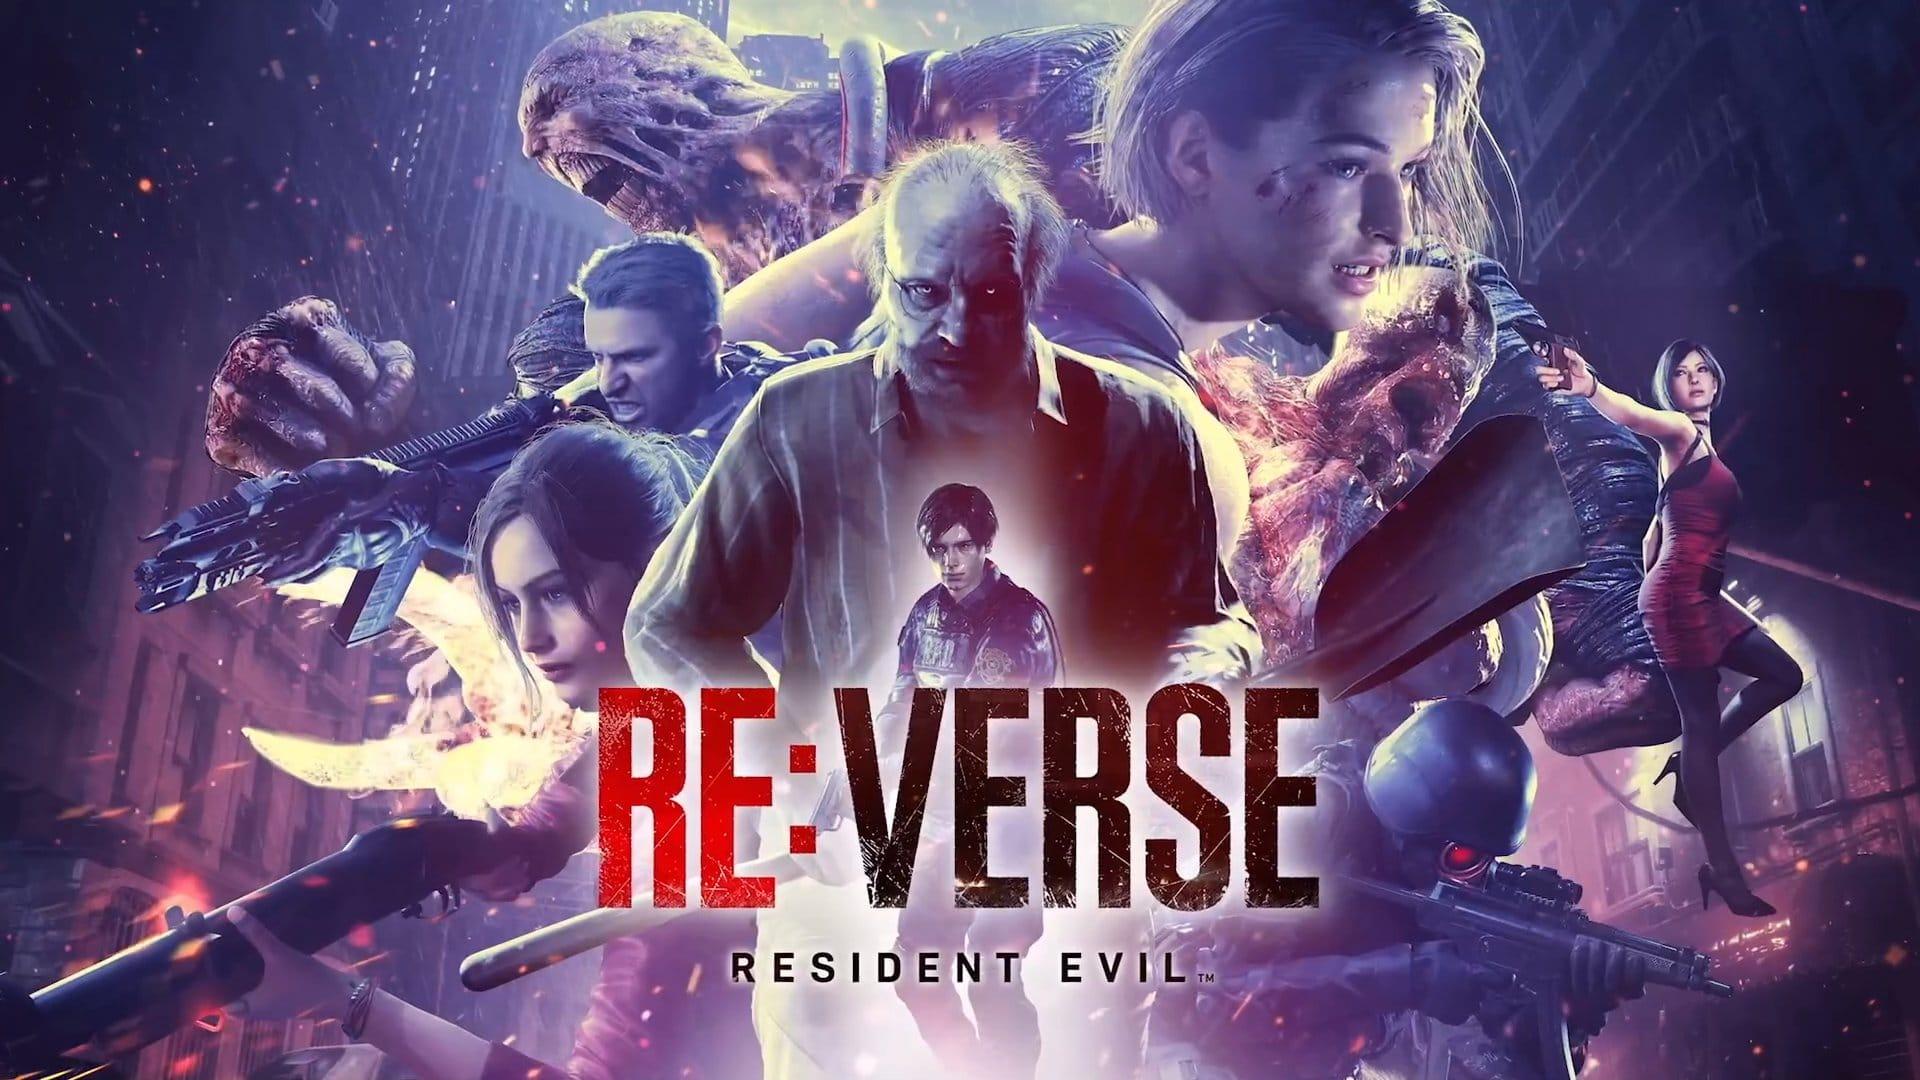 Resident Evil Re:Verse artwork